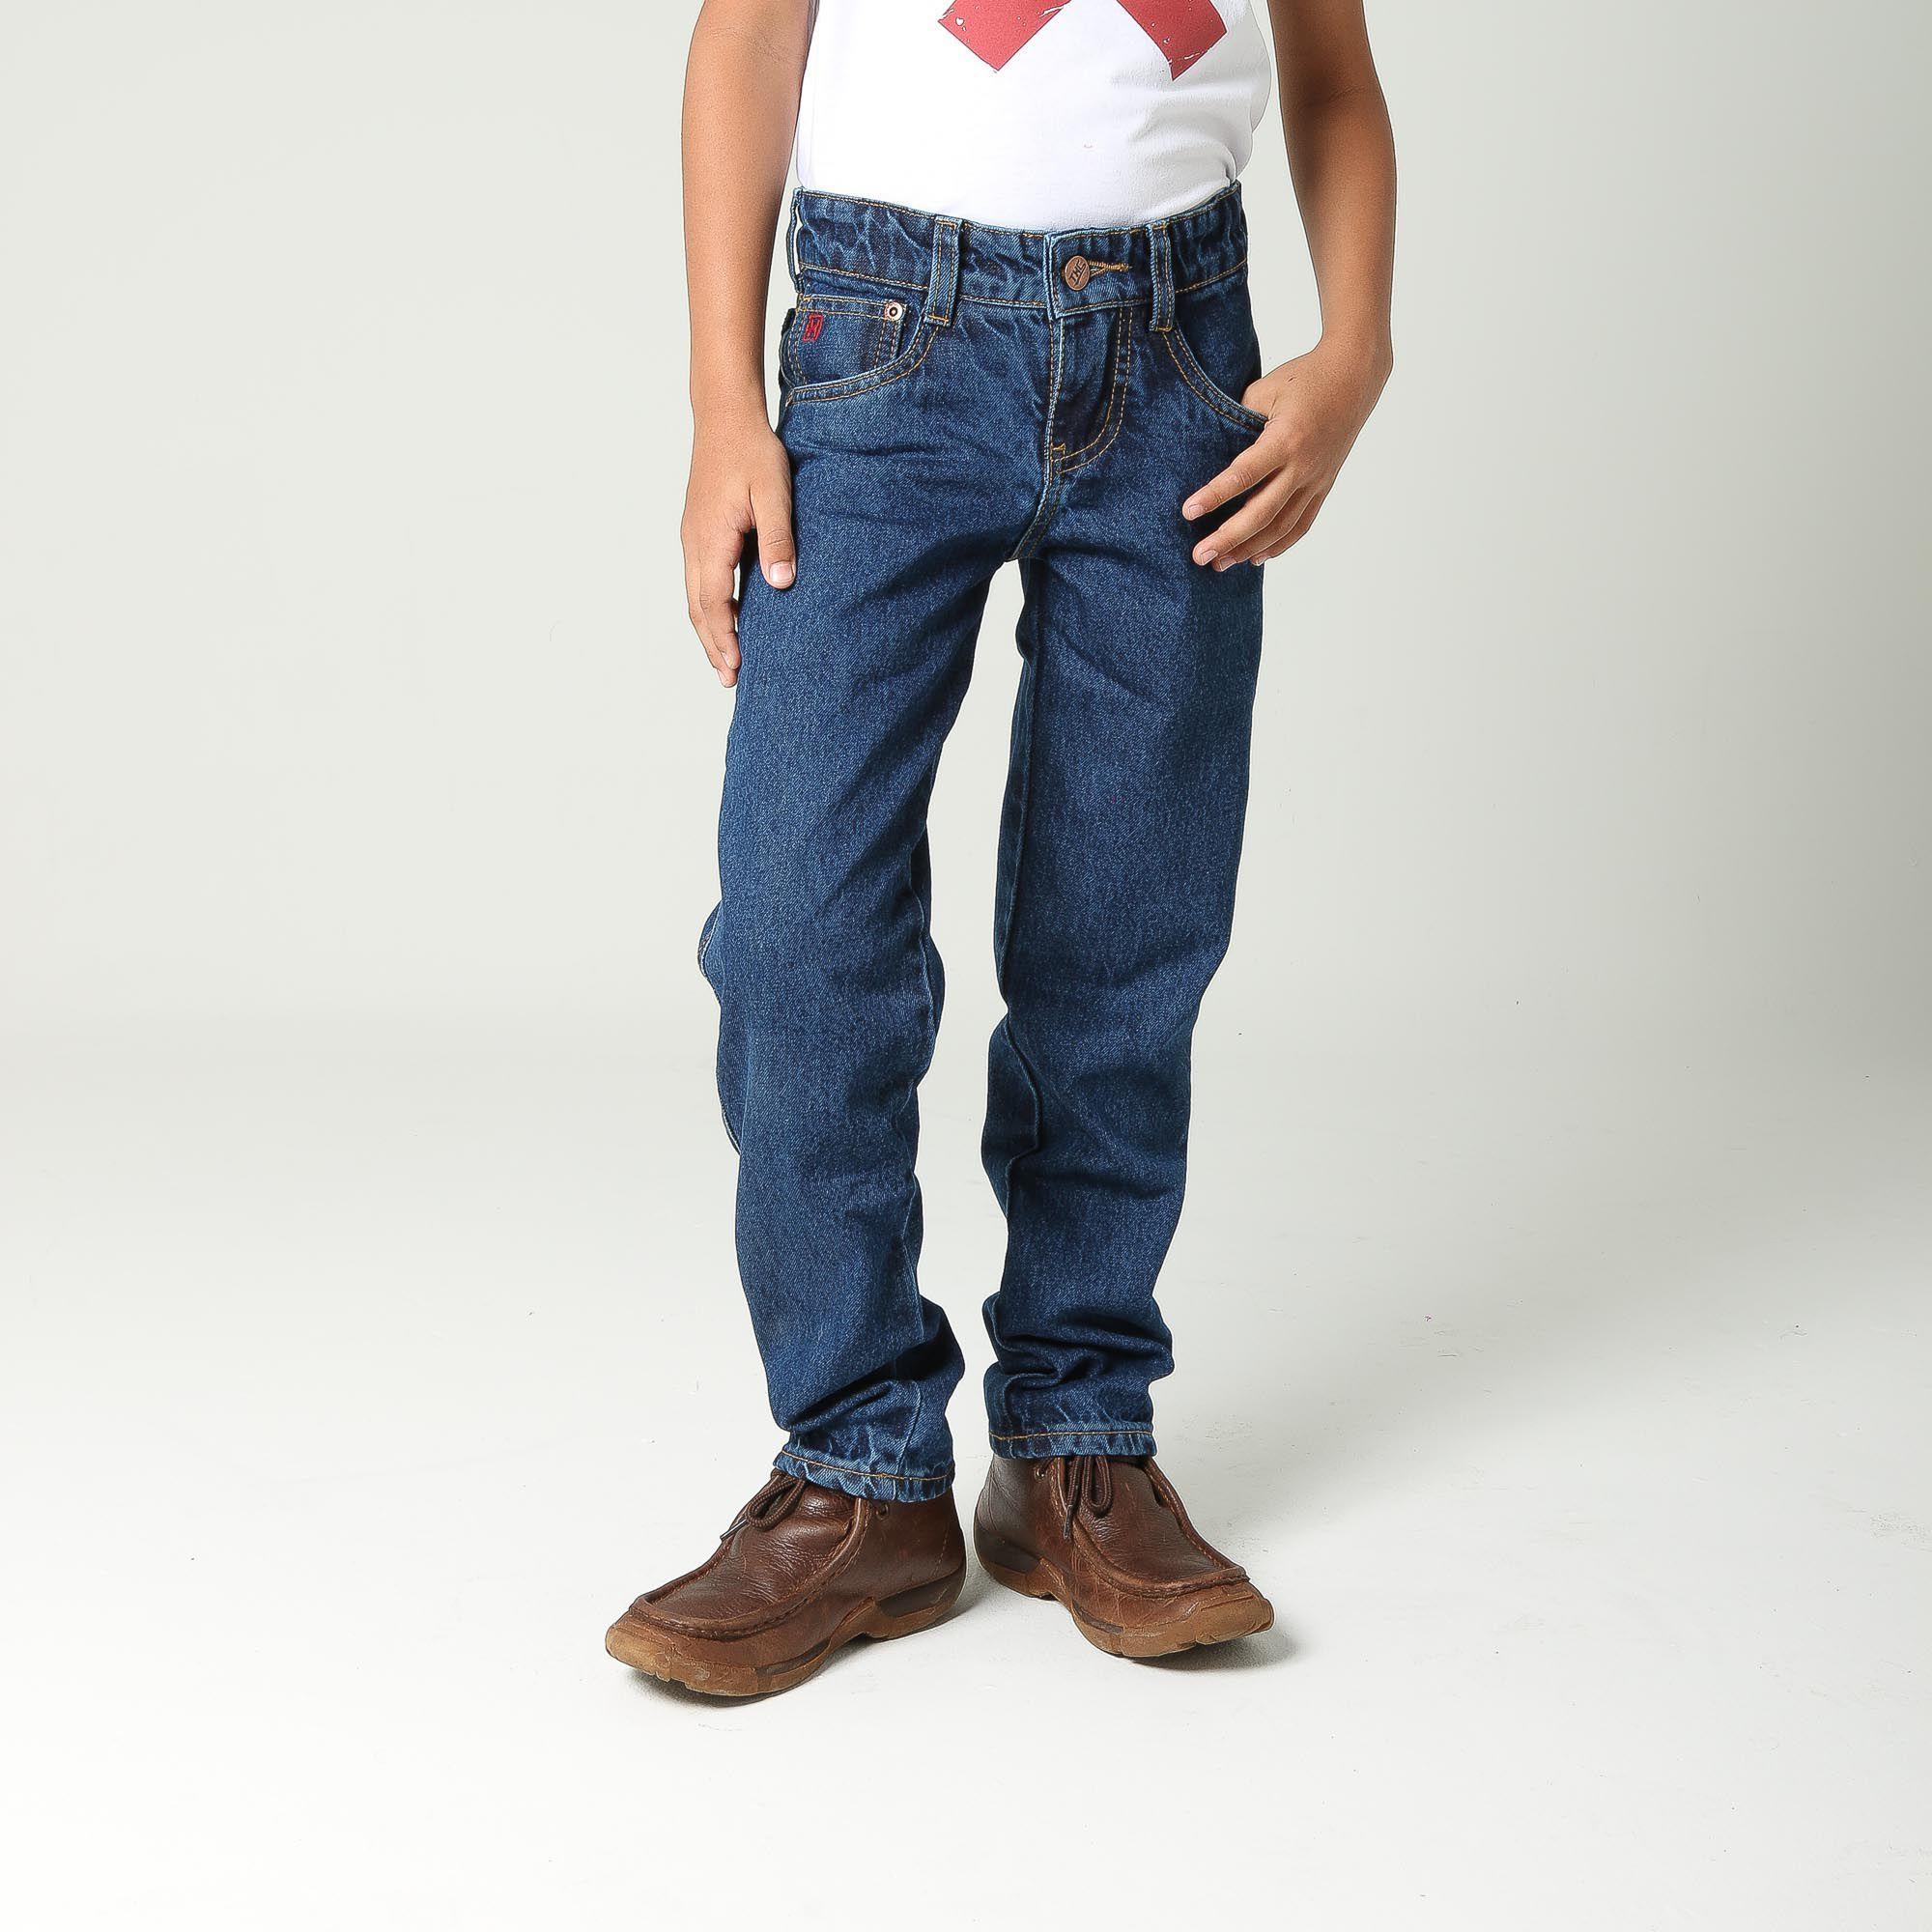 Calça Jeans TXC Infantil Black 29000